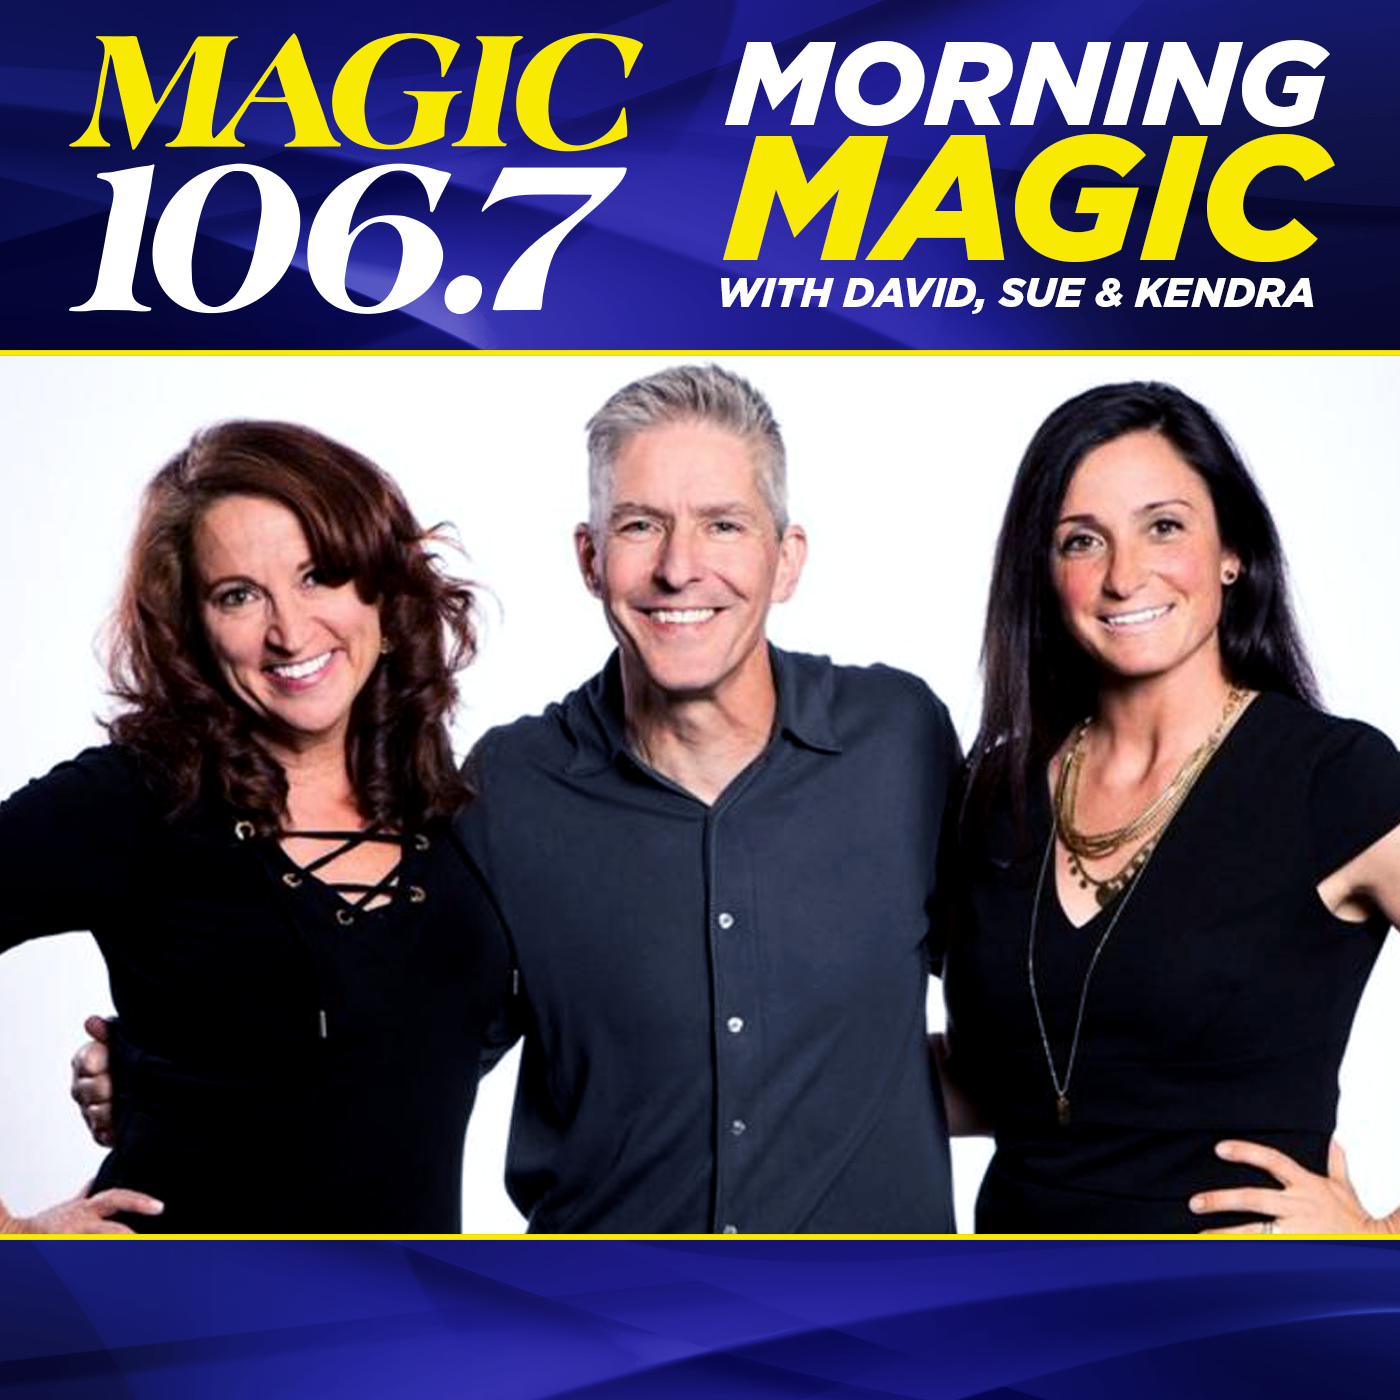 Morning MAGIC with David, Sue, & Kendra